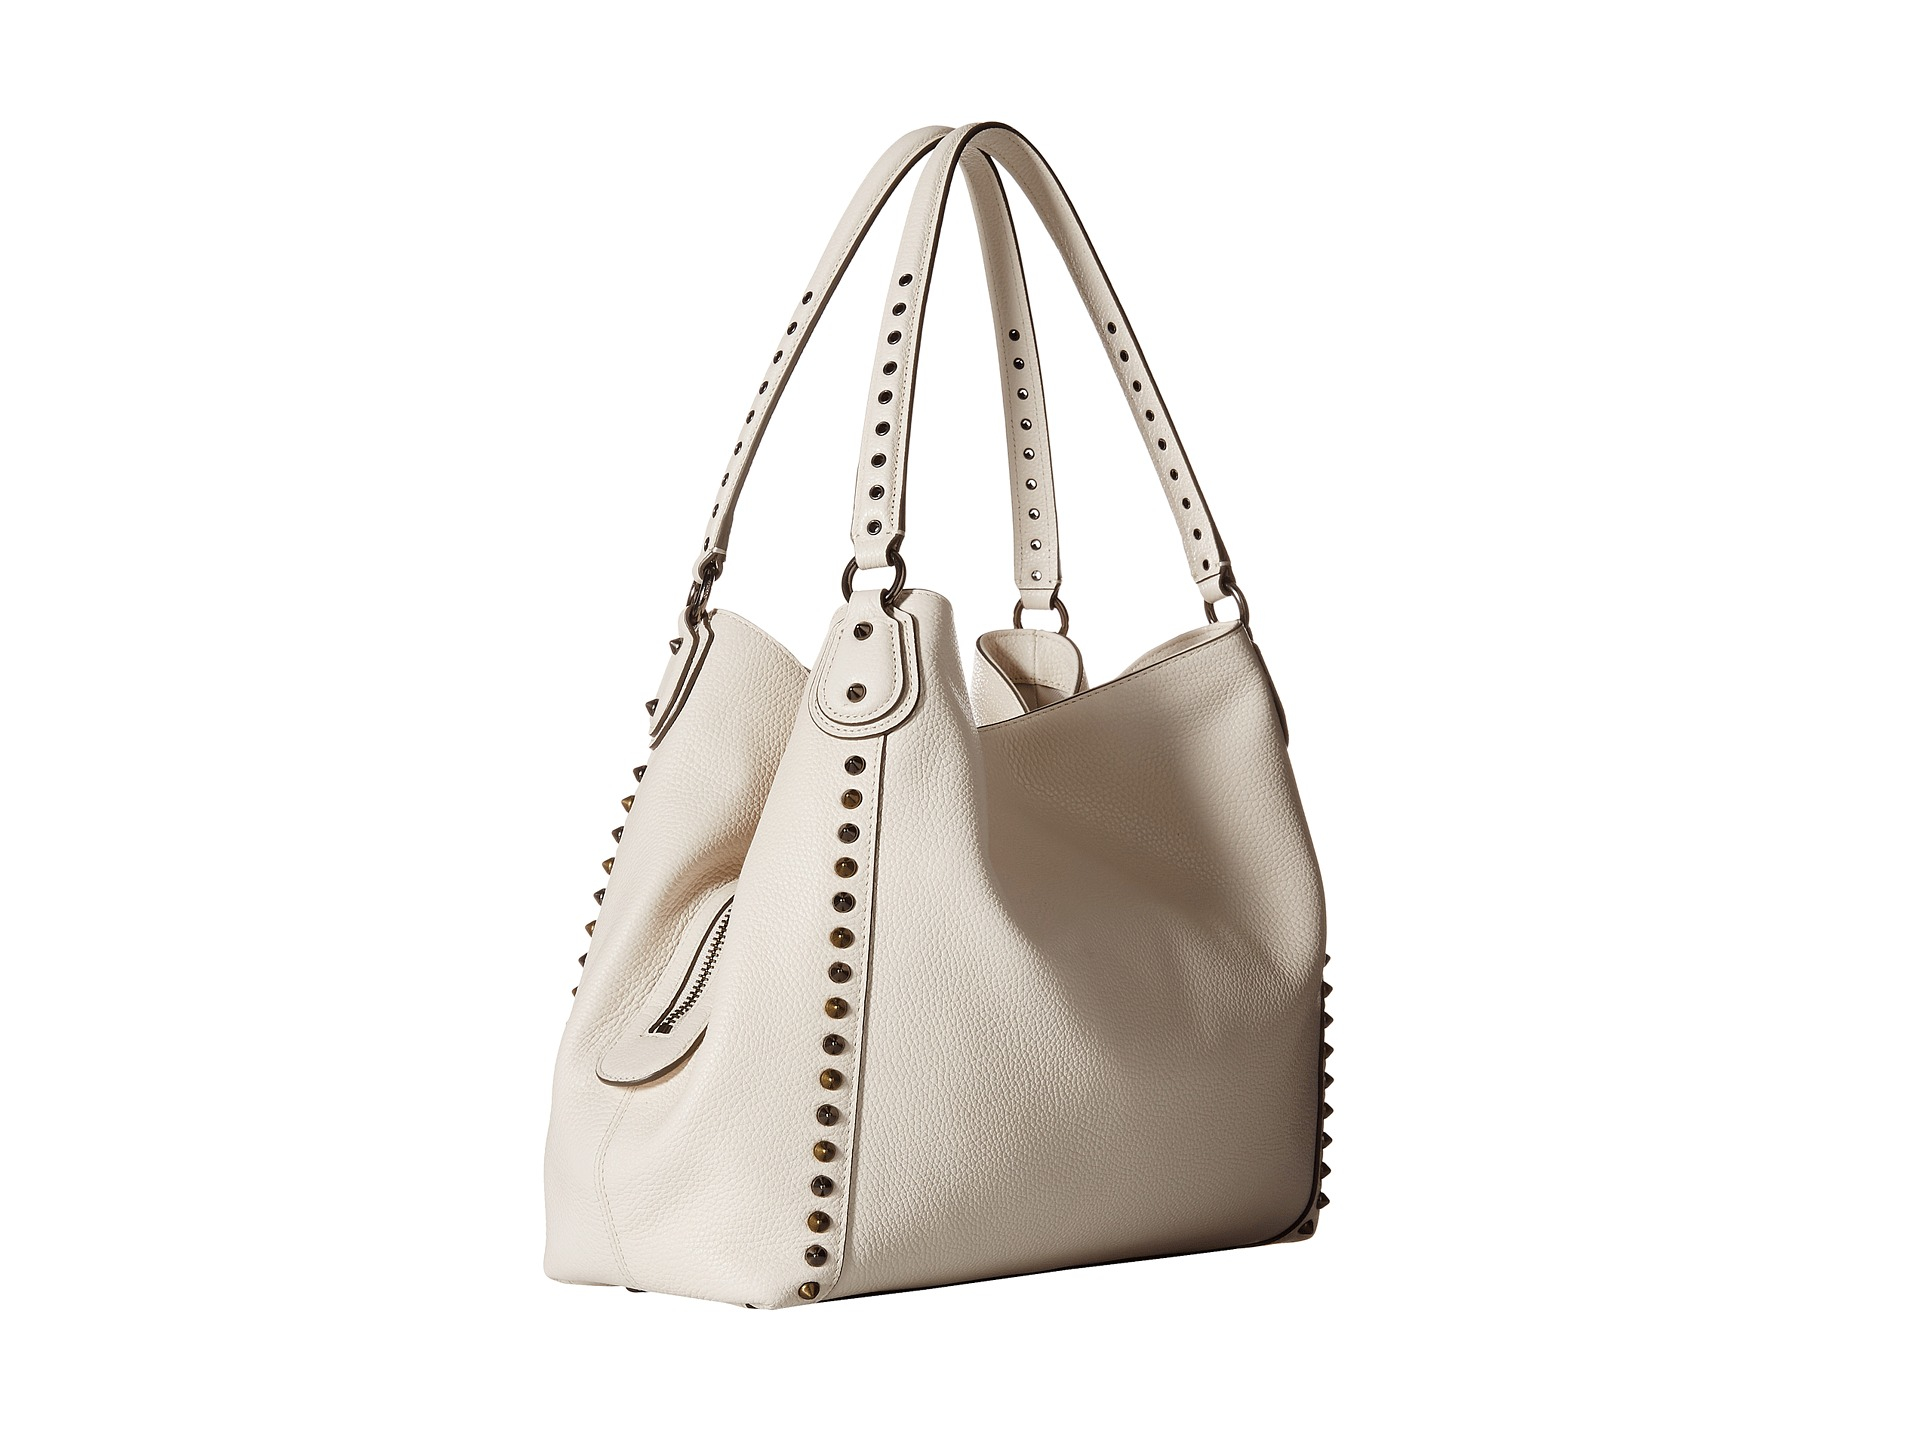 06c1415c41935 COACH Edie 31 Shoulder Bag in White - Lyst